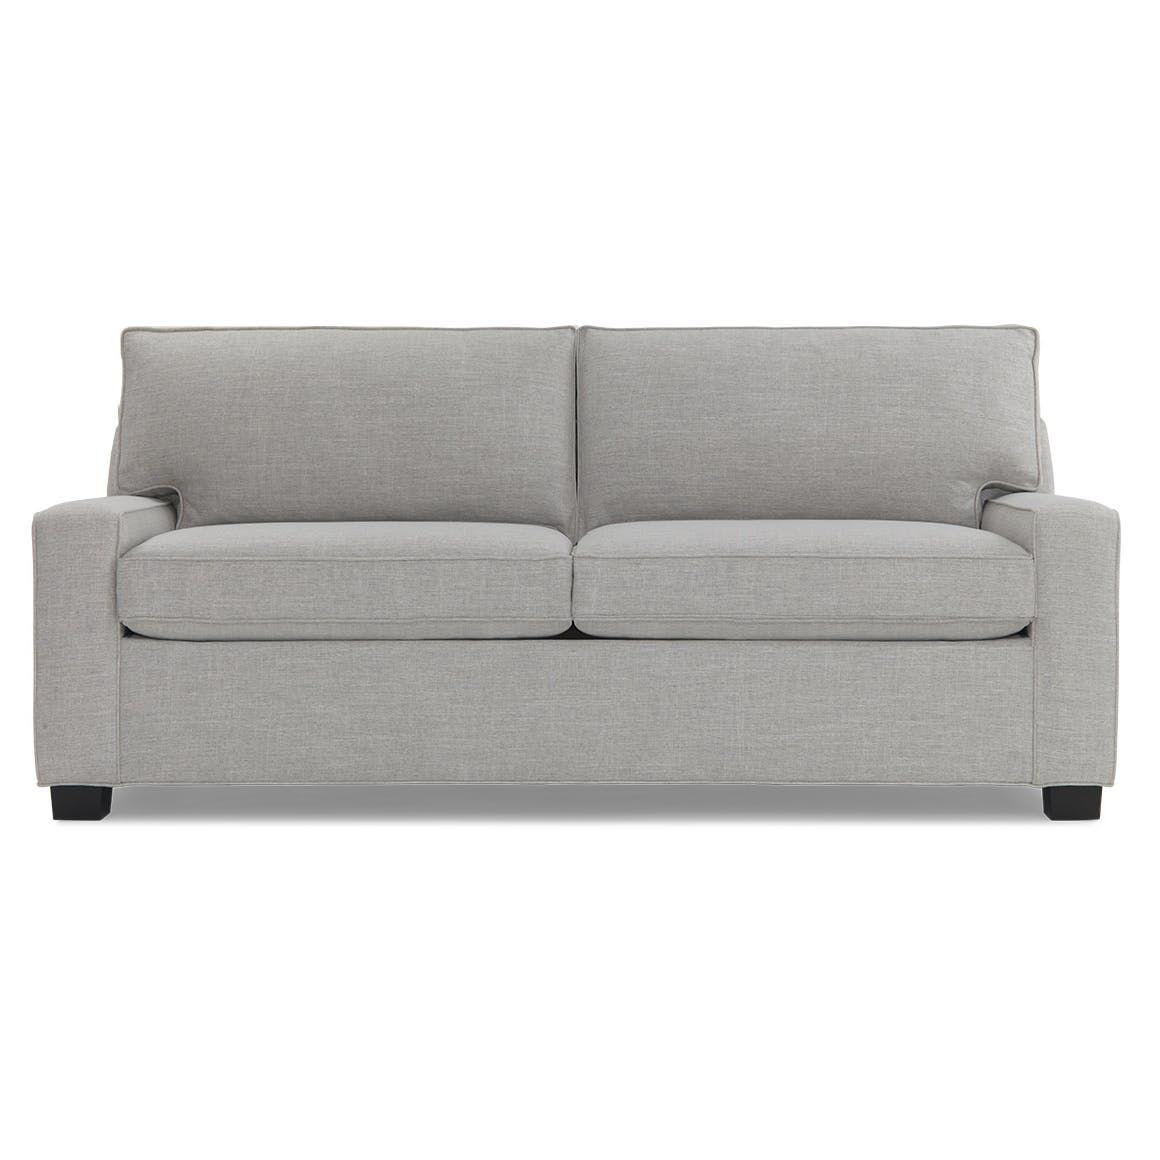 The Best Sleeper Sofas And Sofa Beds Best Sleeper Sofa Sleeper